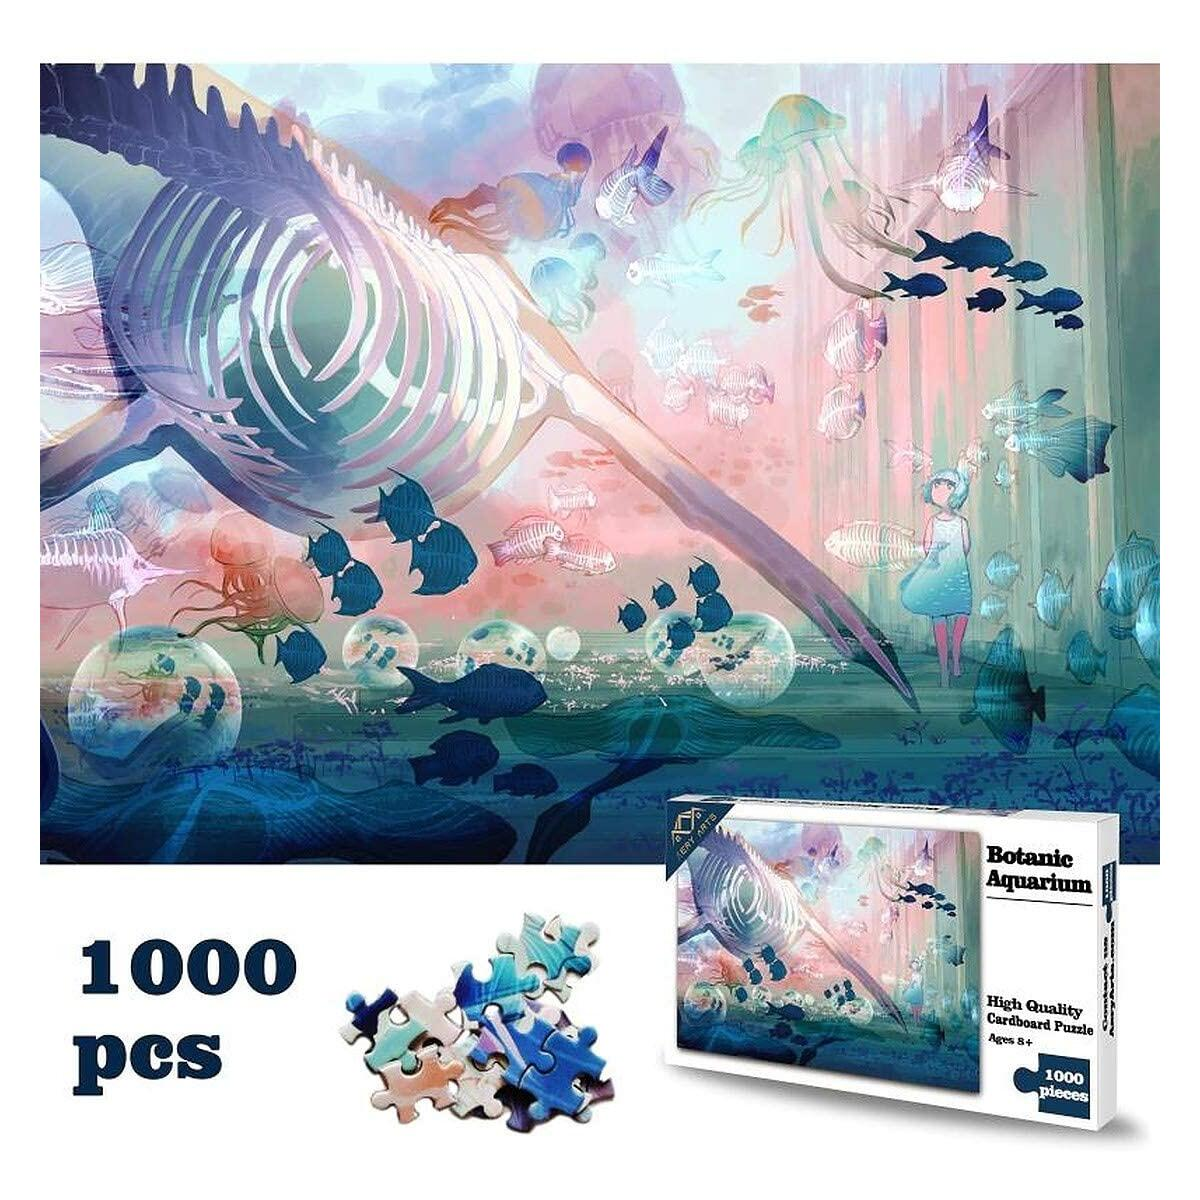 1000 Piece Jigsaw Puzzle Aquarium